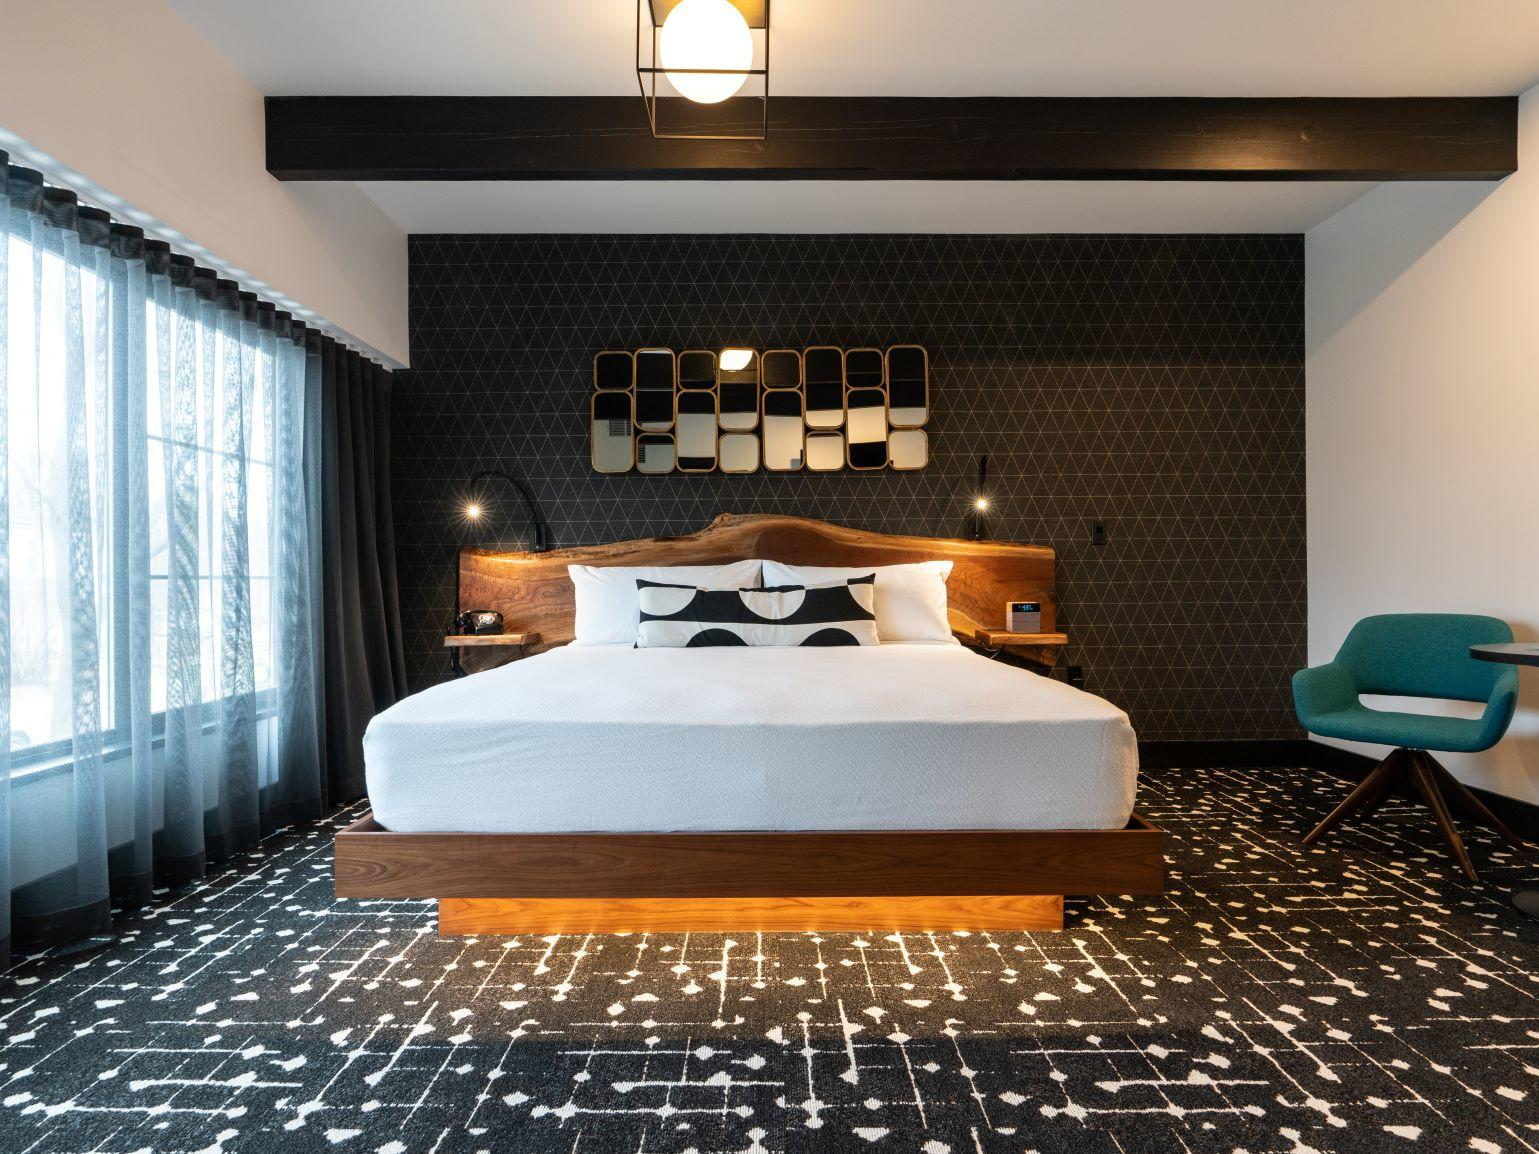 King room at Hotel Earl